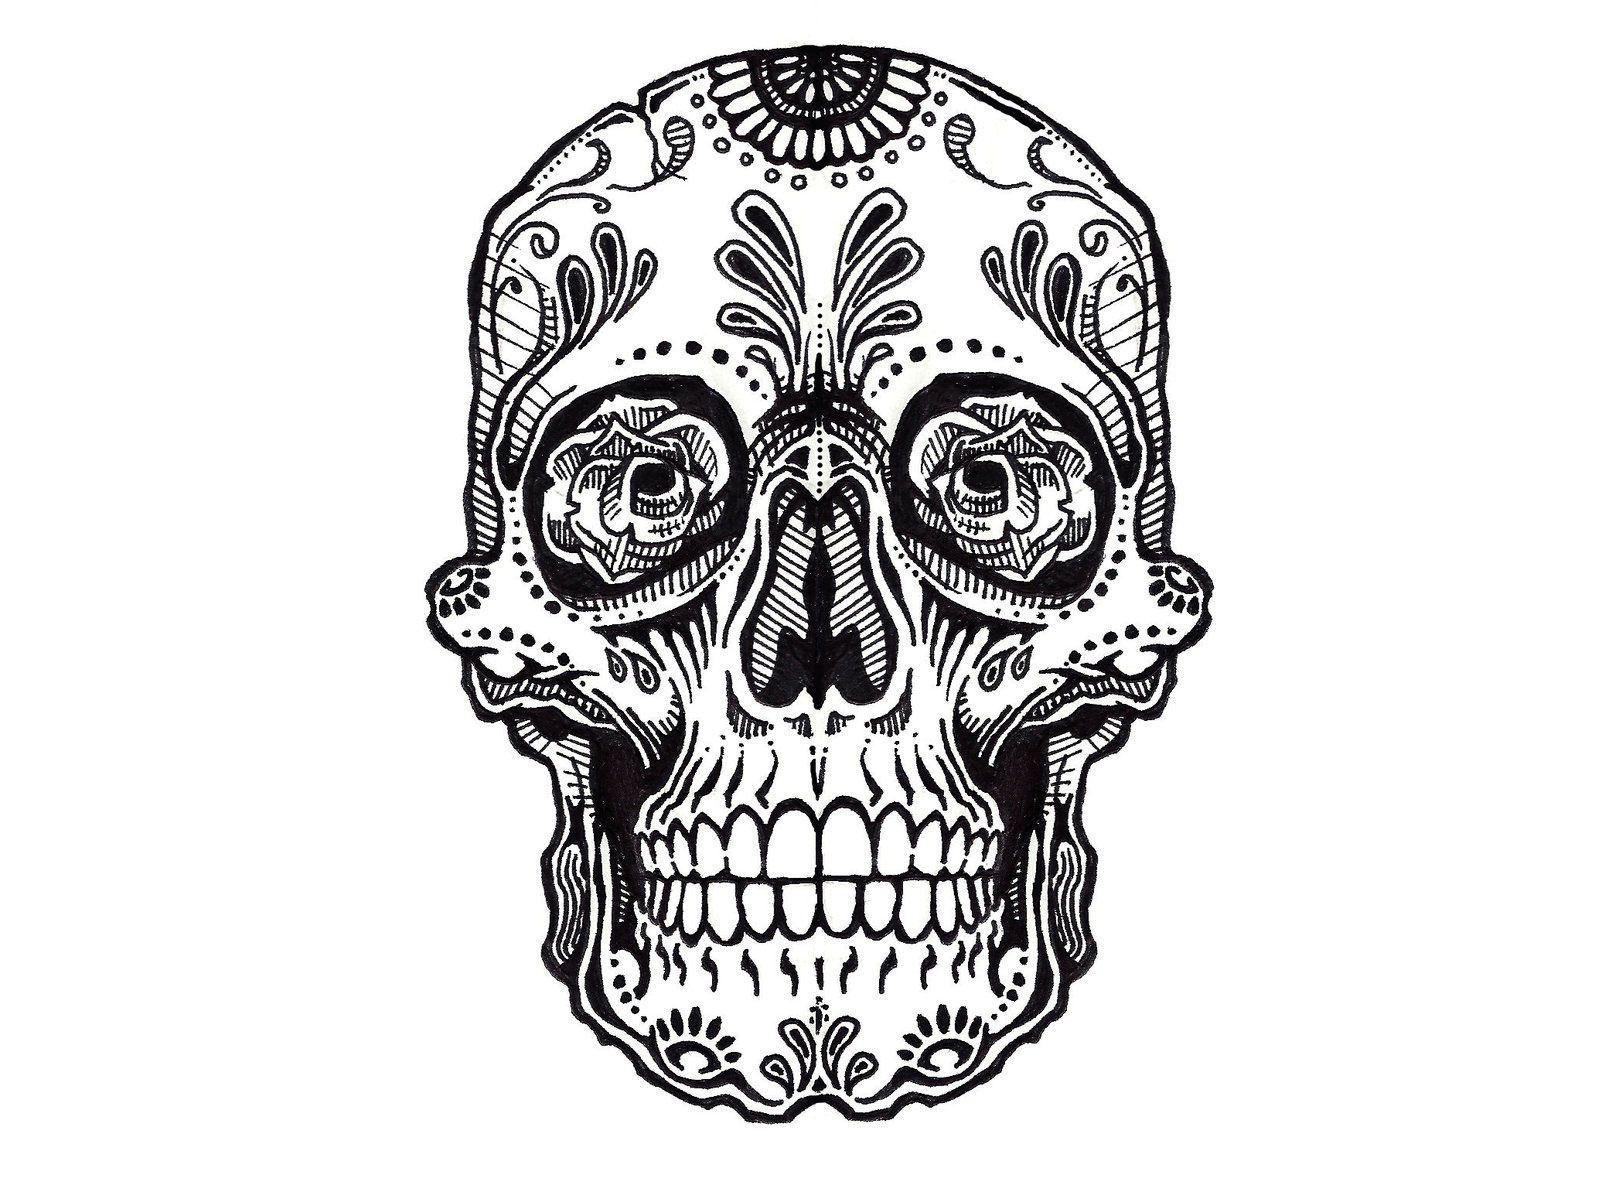 Tattoo Designs Skull Simple Valoblogi Com